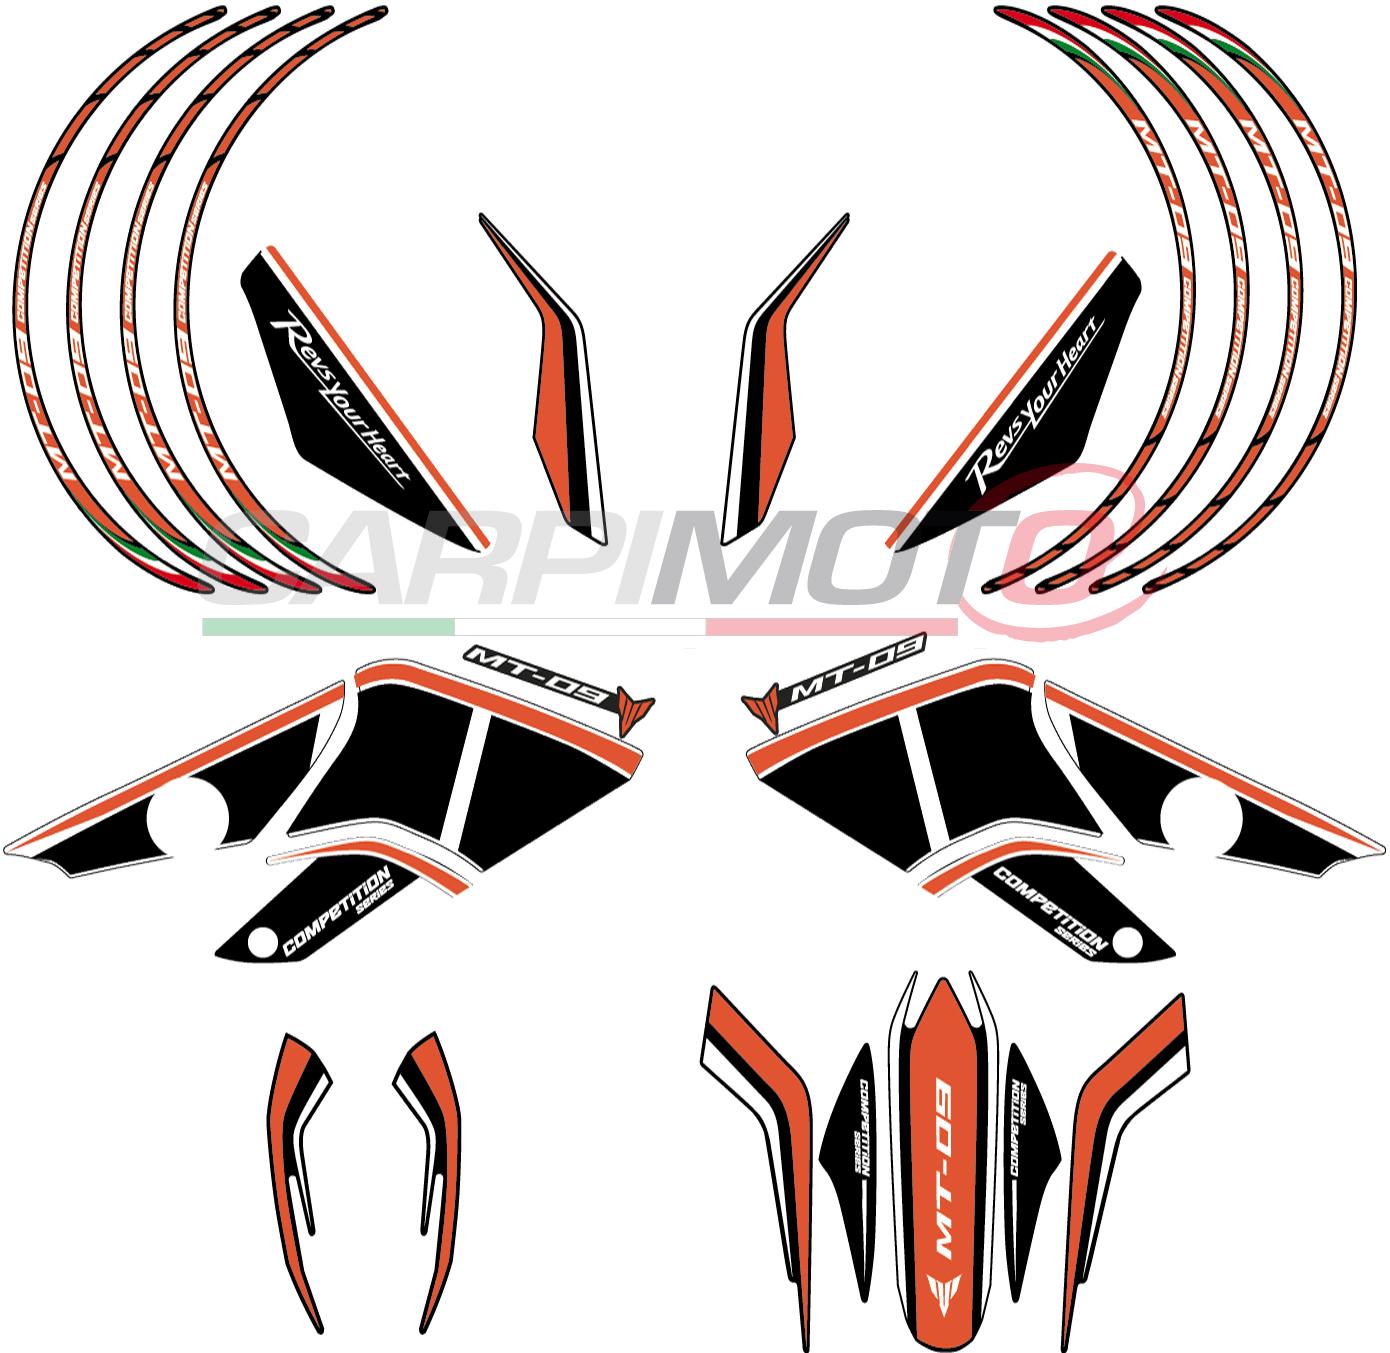 Complete stickers for yamaha mt 09 color black white orange matt finish